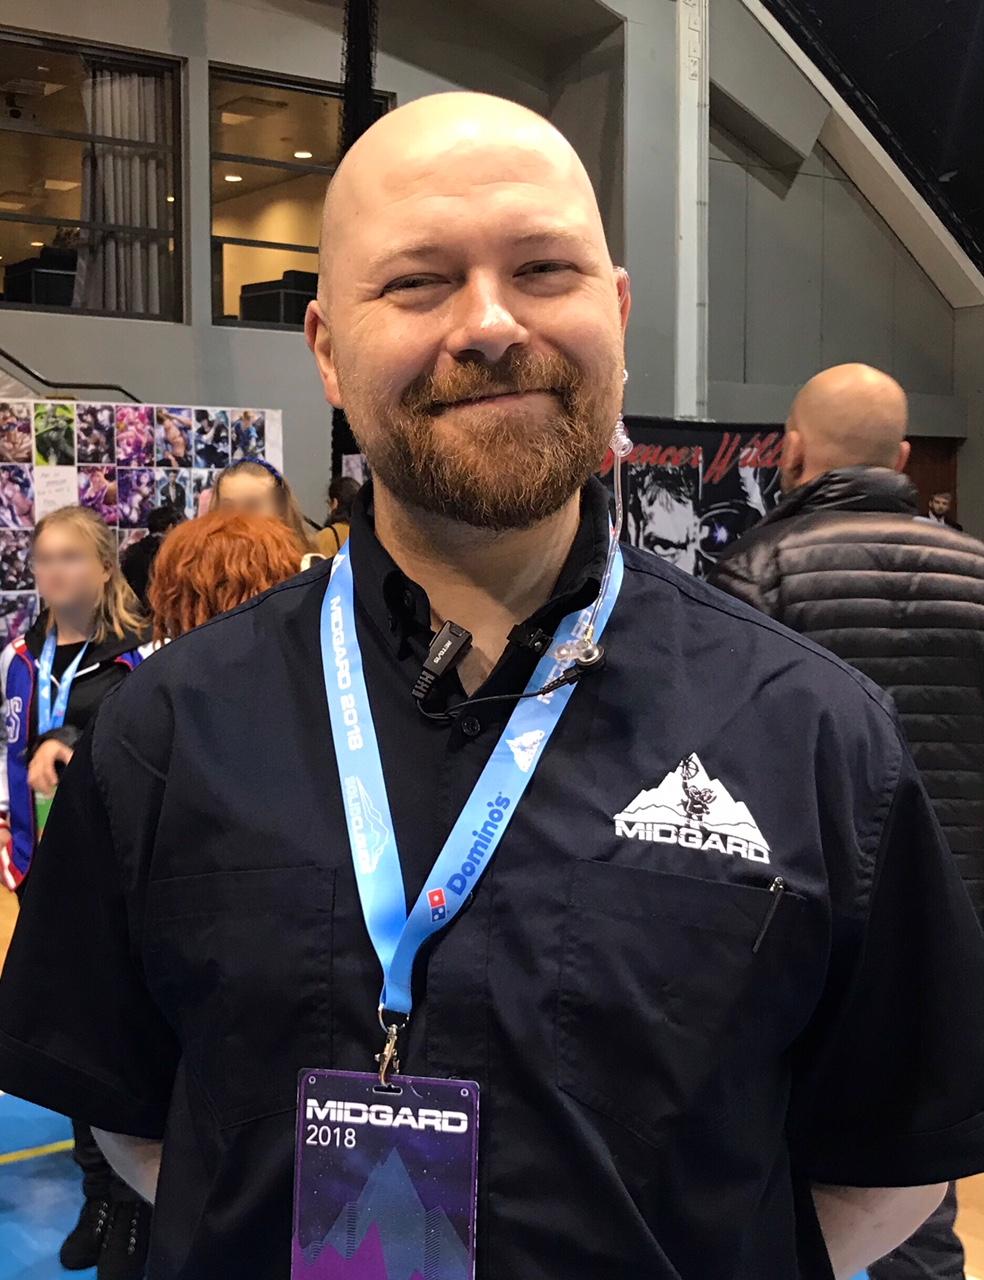 Sveinn Ólafur Lárusson one of Midgard's 2018 organizing staff members.